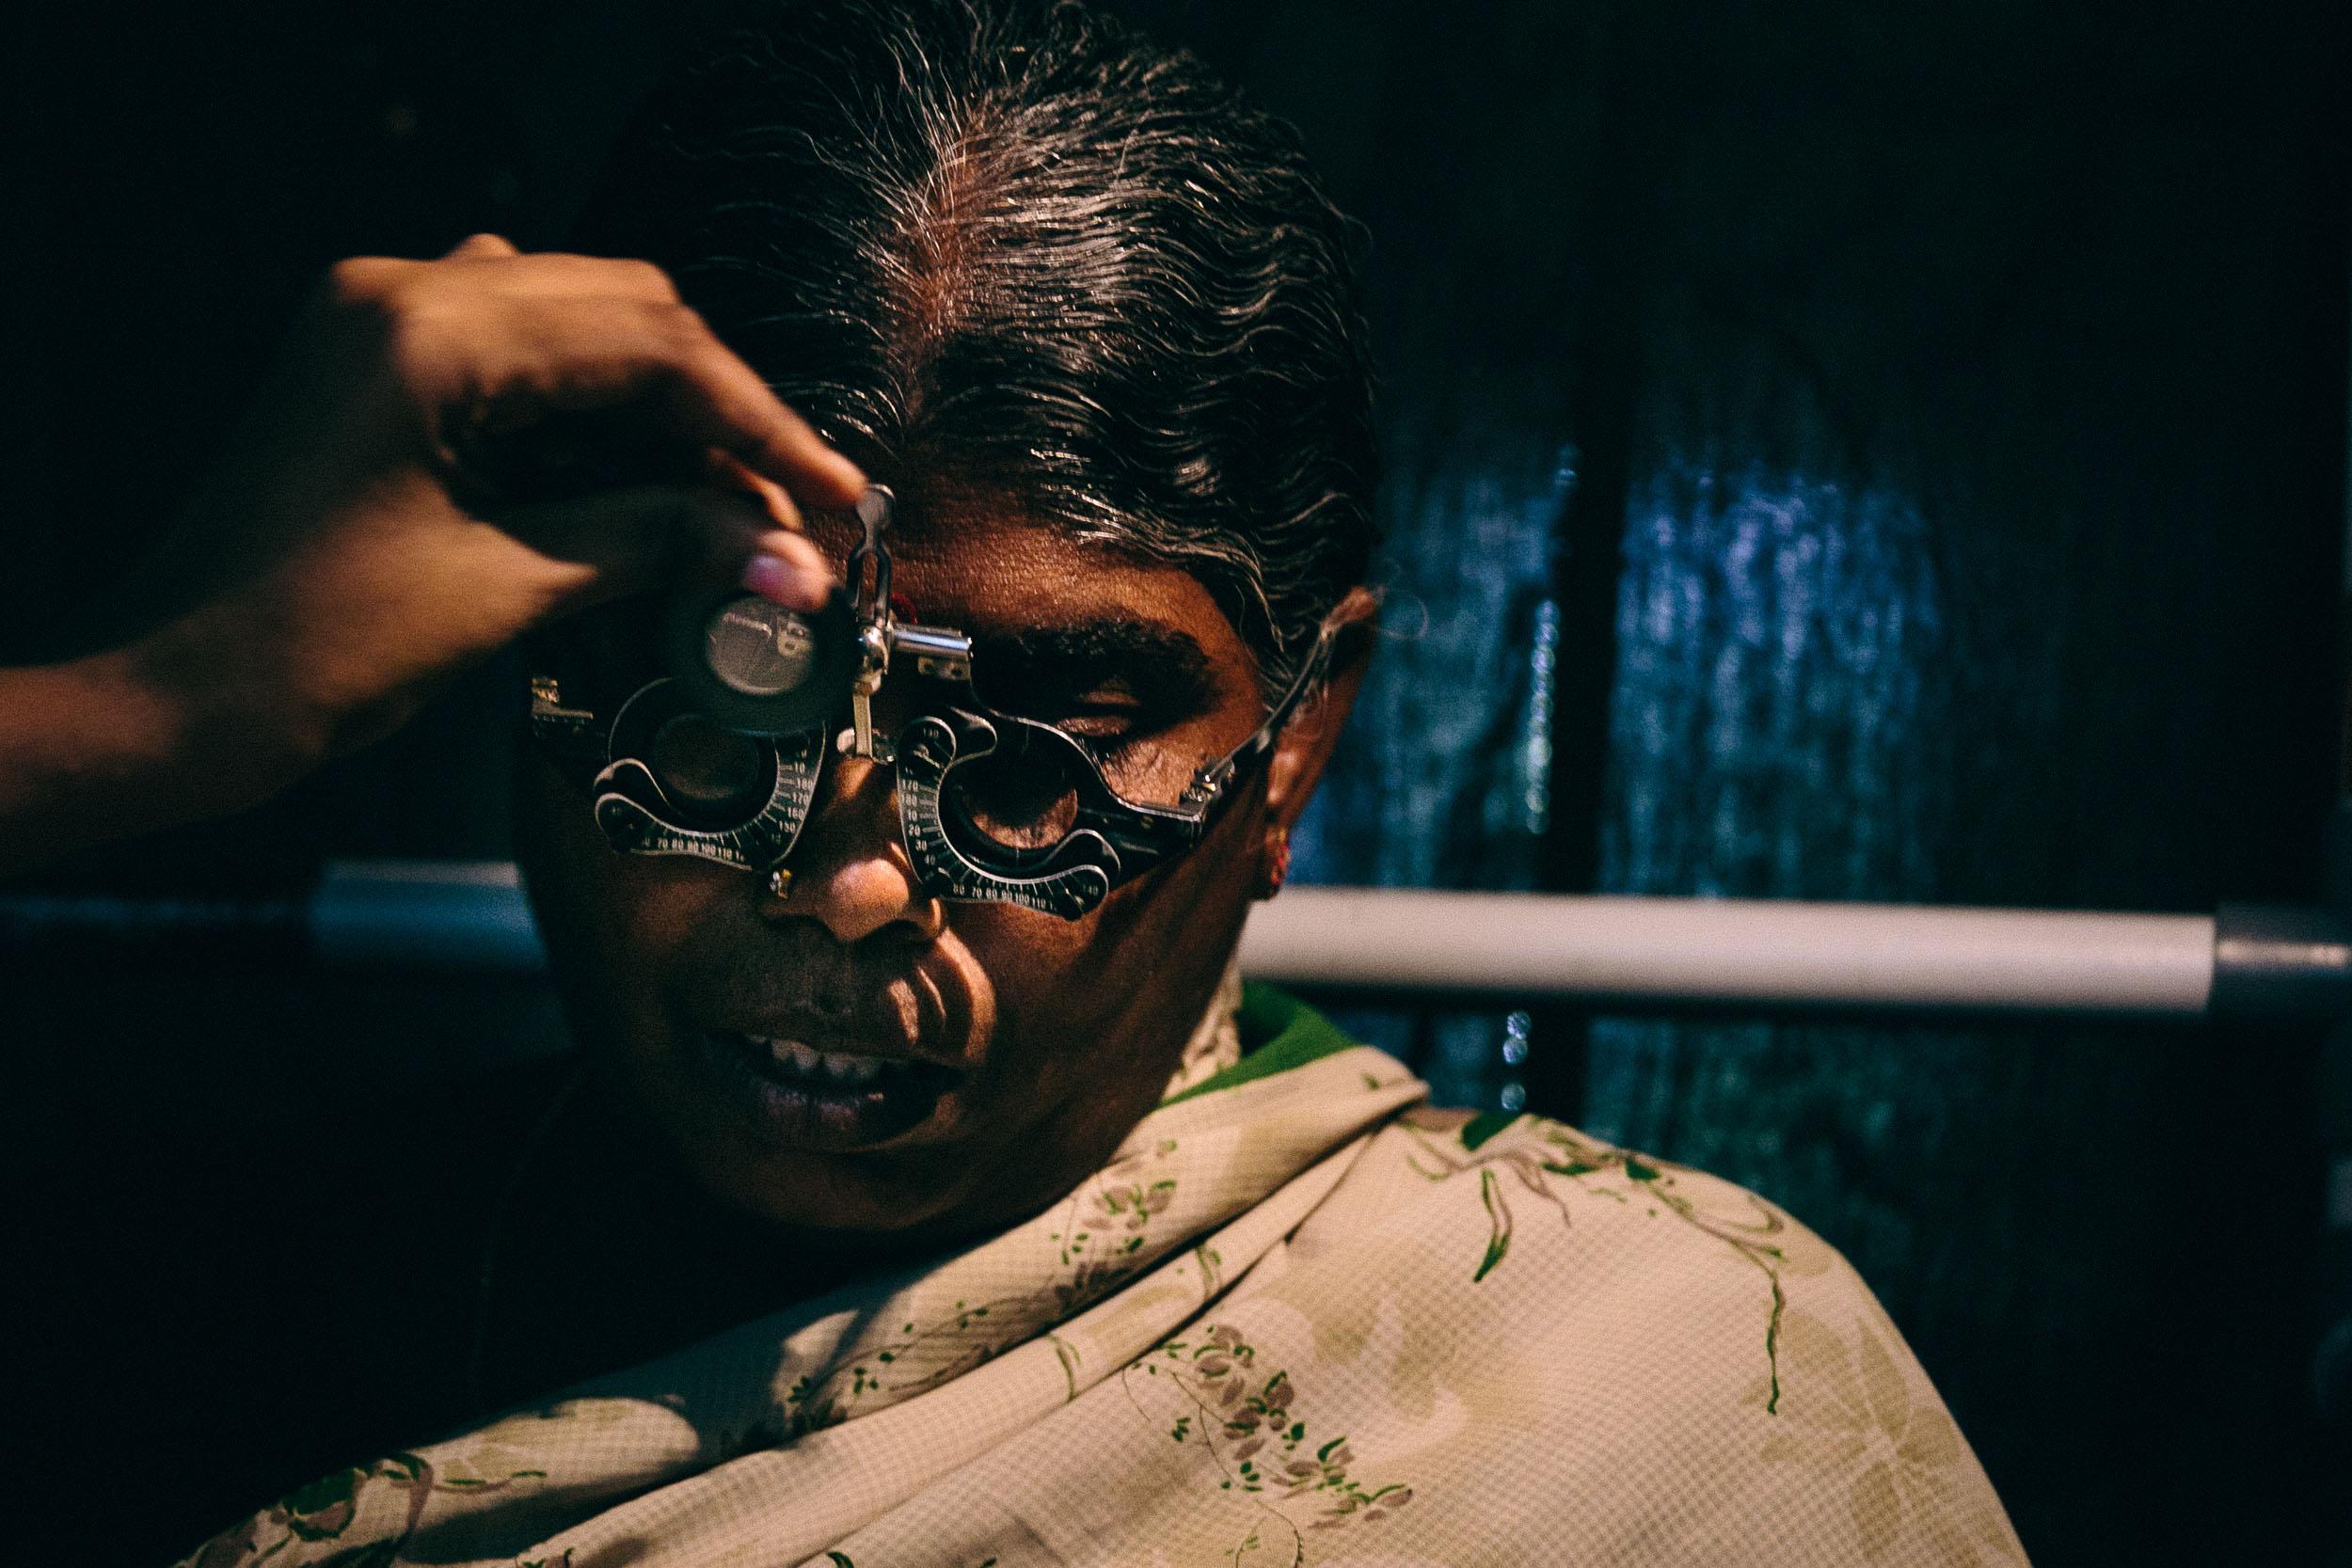 brian-callaway-india-photography-aravind-eye-hospital-25.jpg